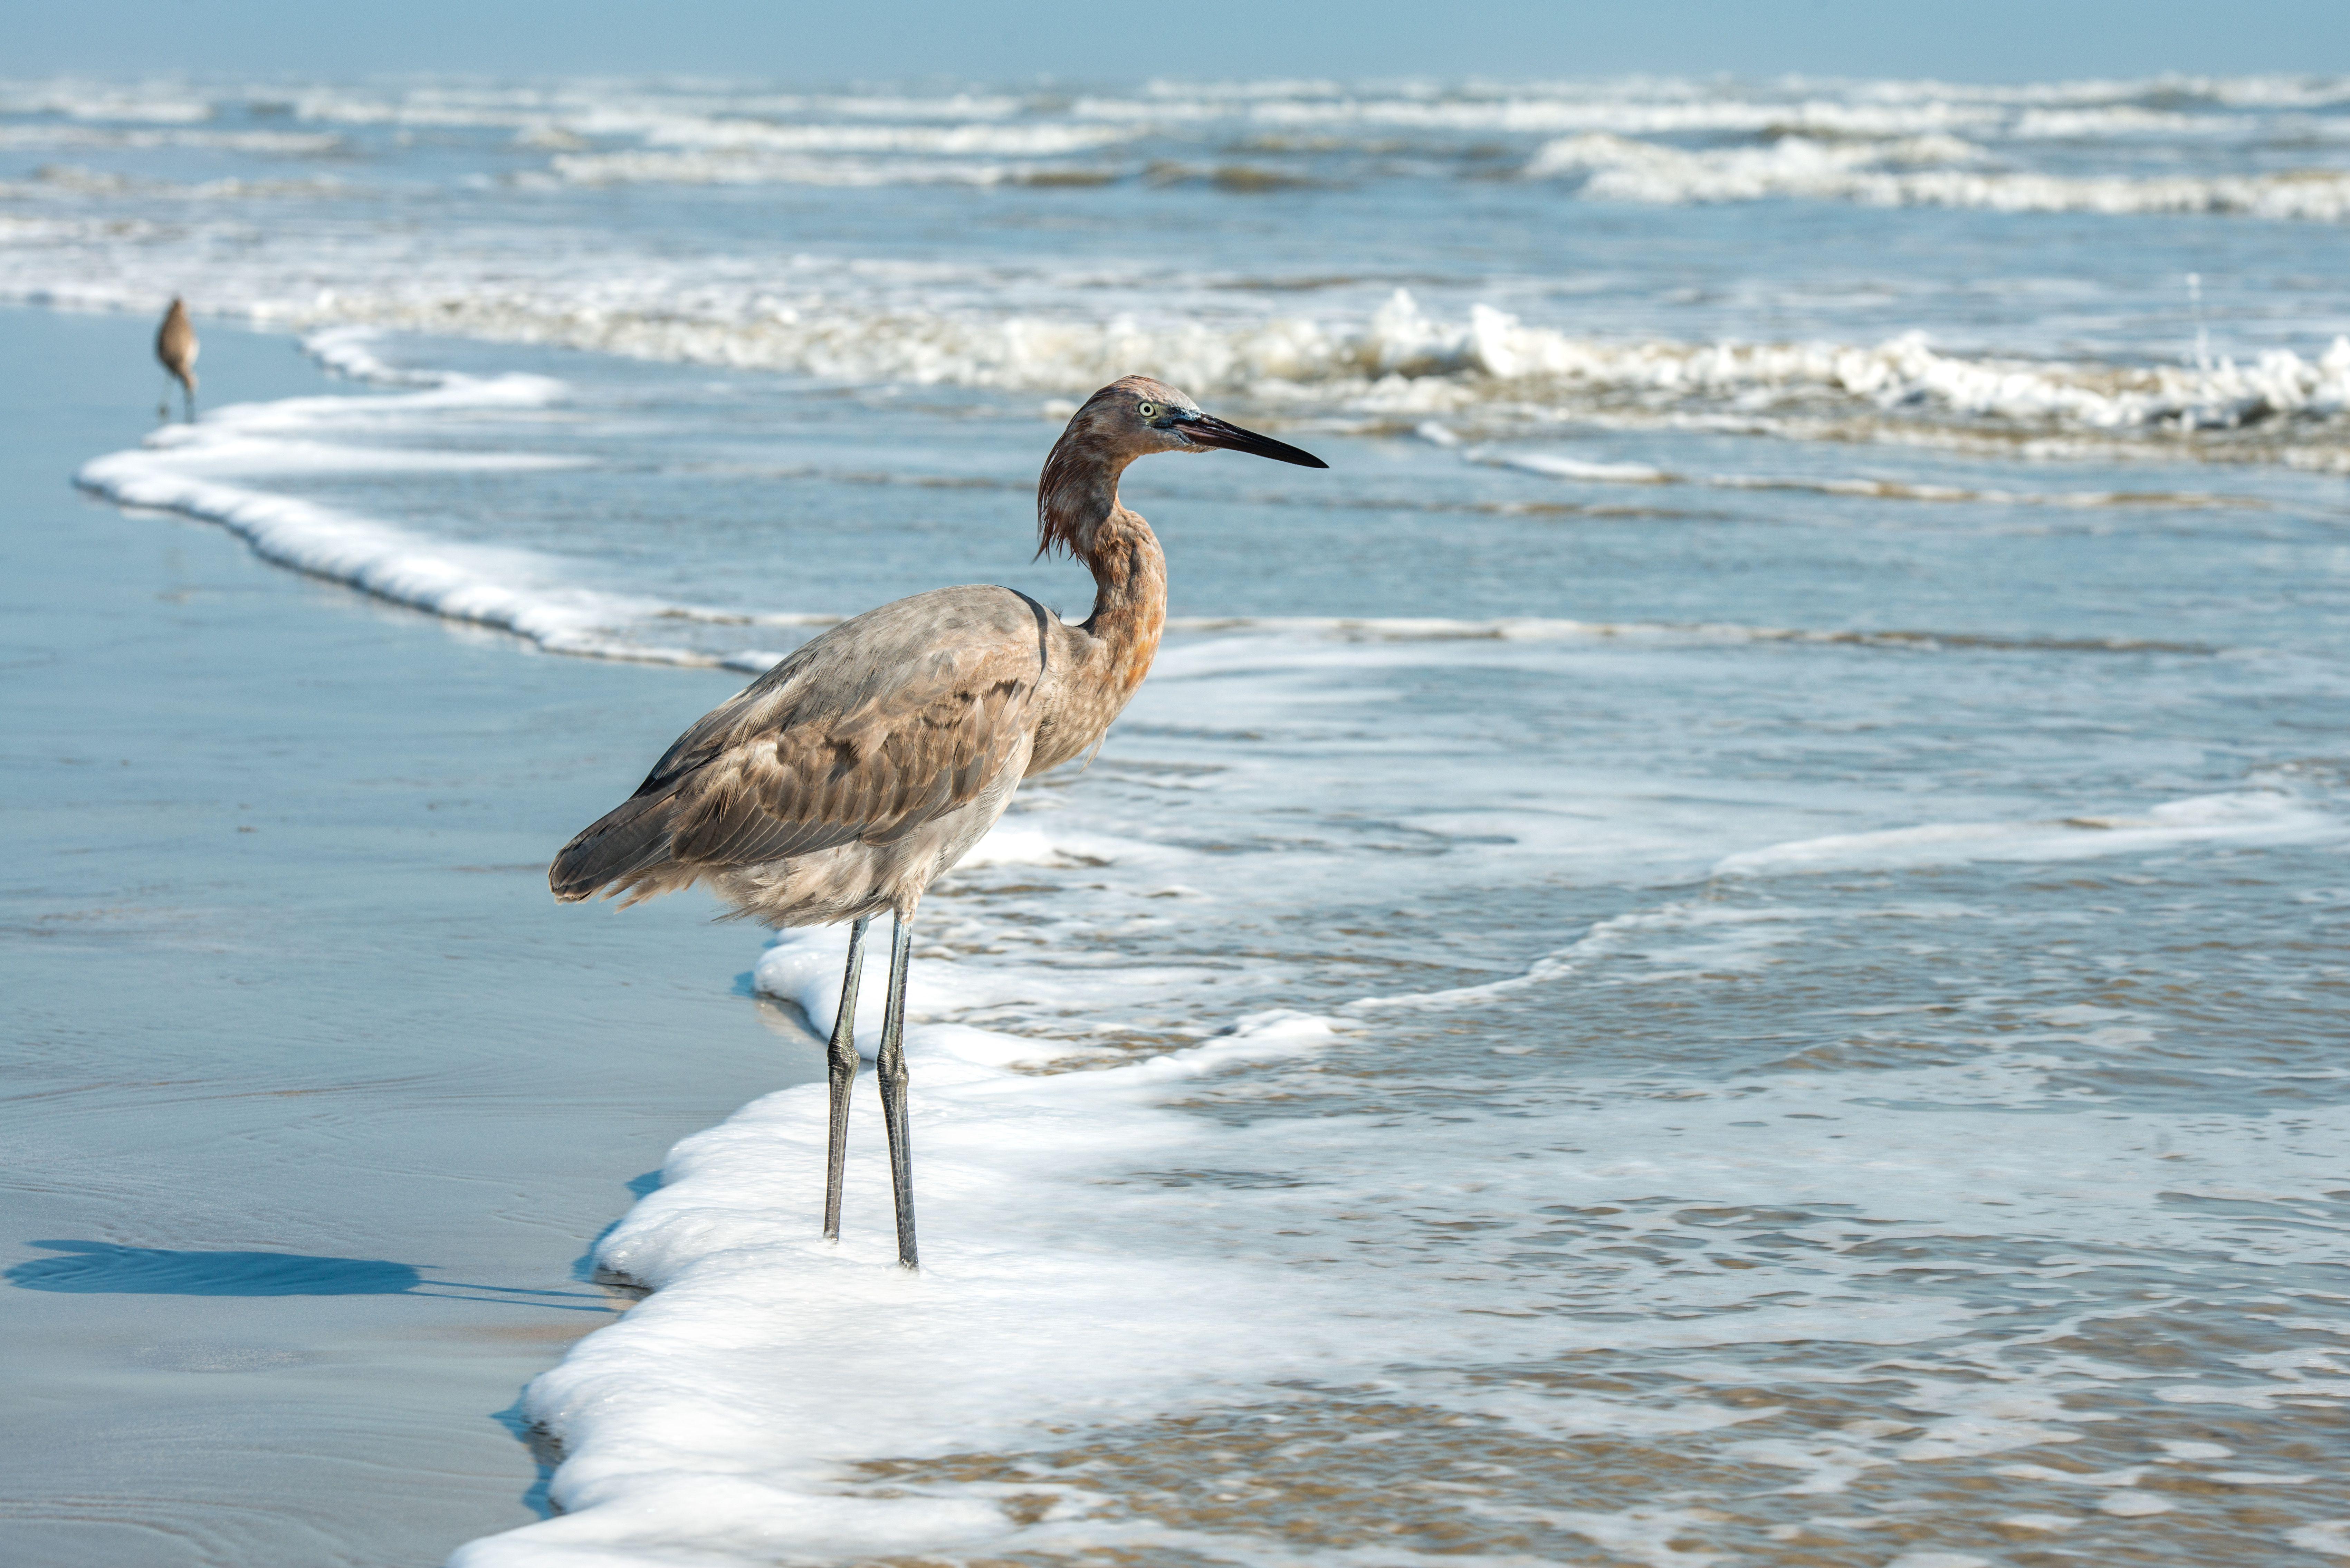 Great Blue Heron standing on the beach in Port Aransas, Texas